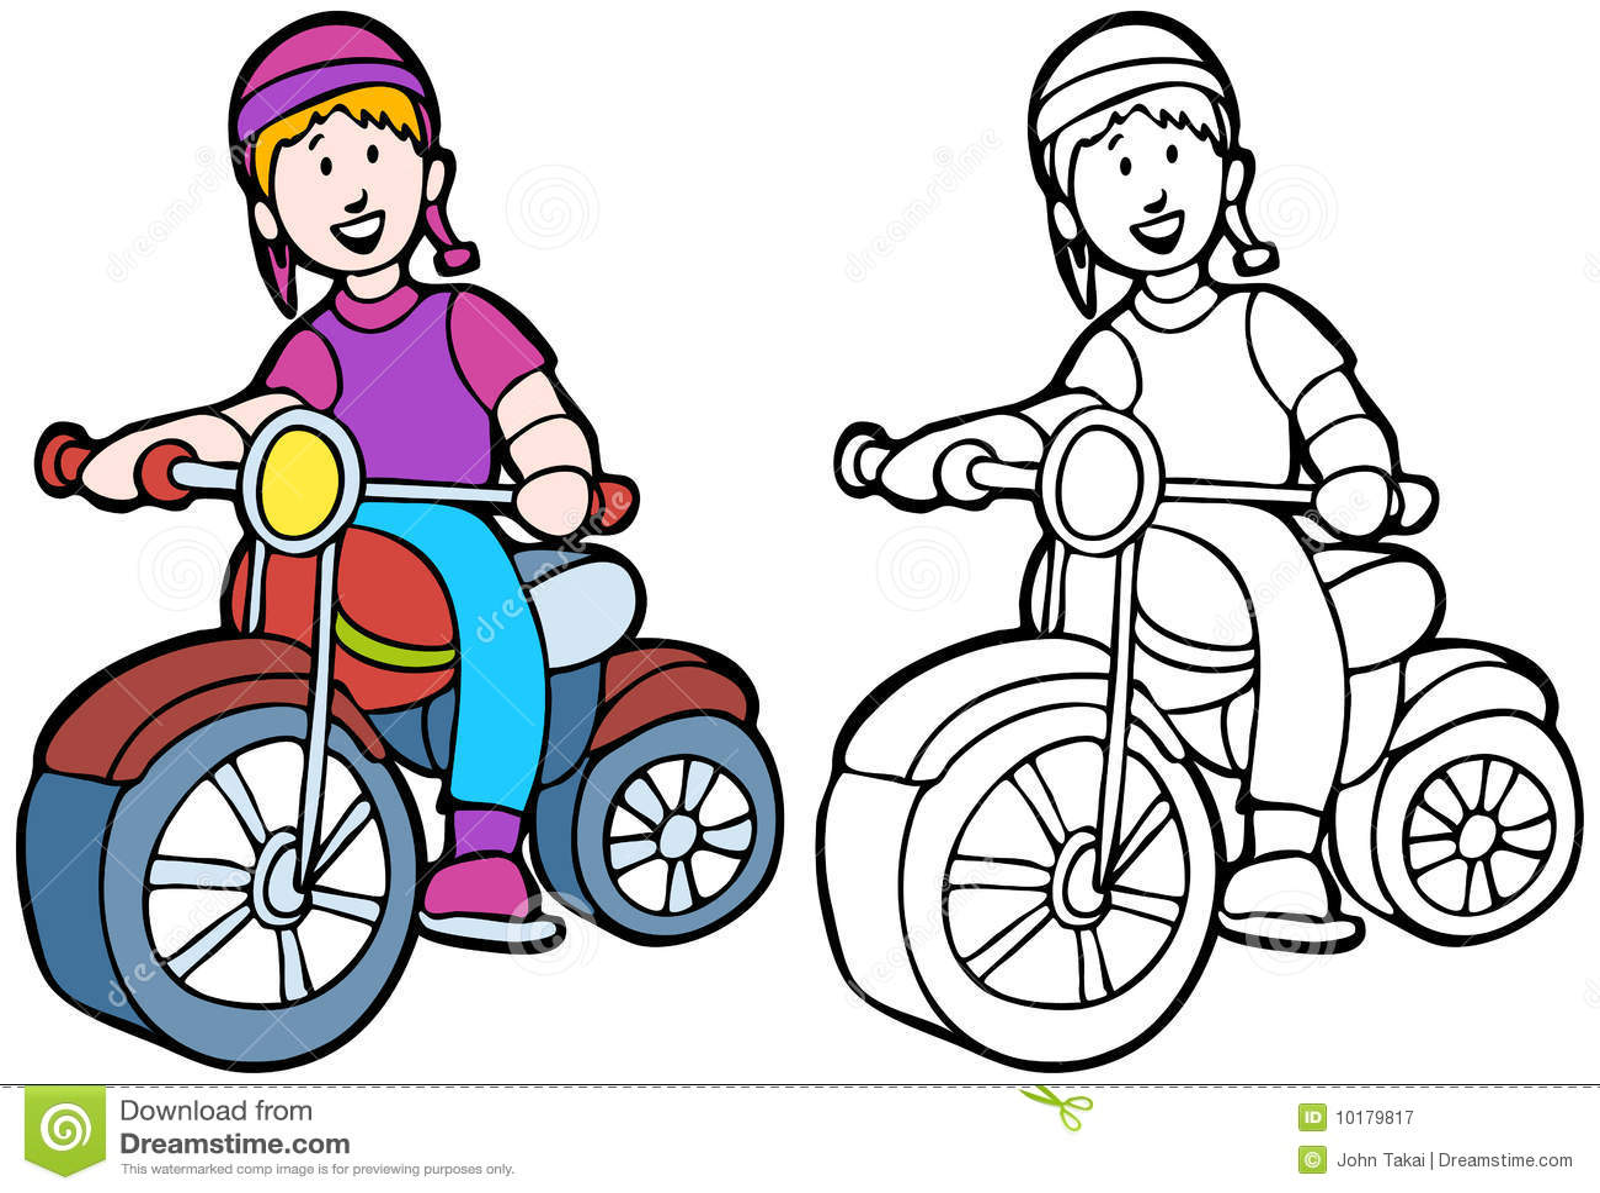 Kid Riding A Bike Stock Vector Illustration Of Cartoon